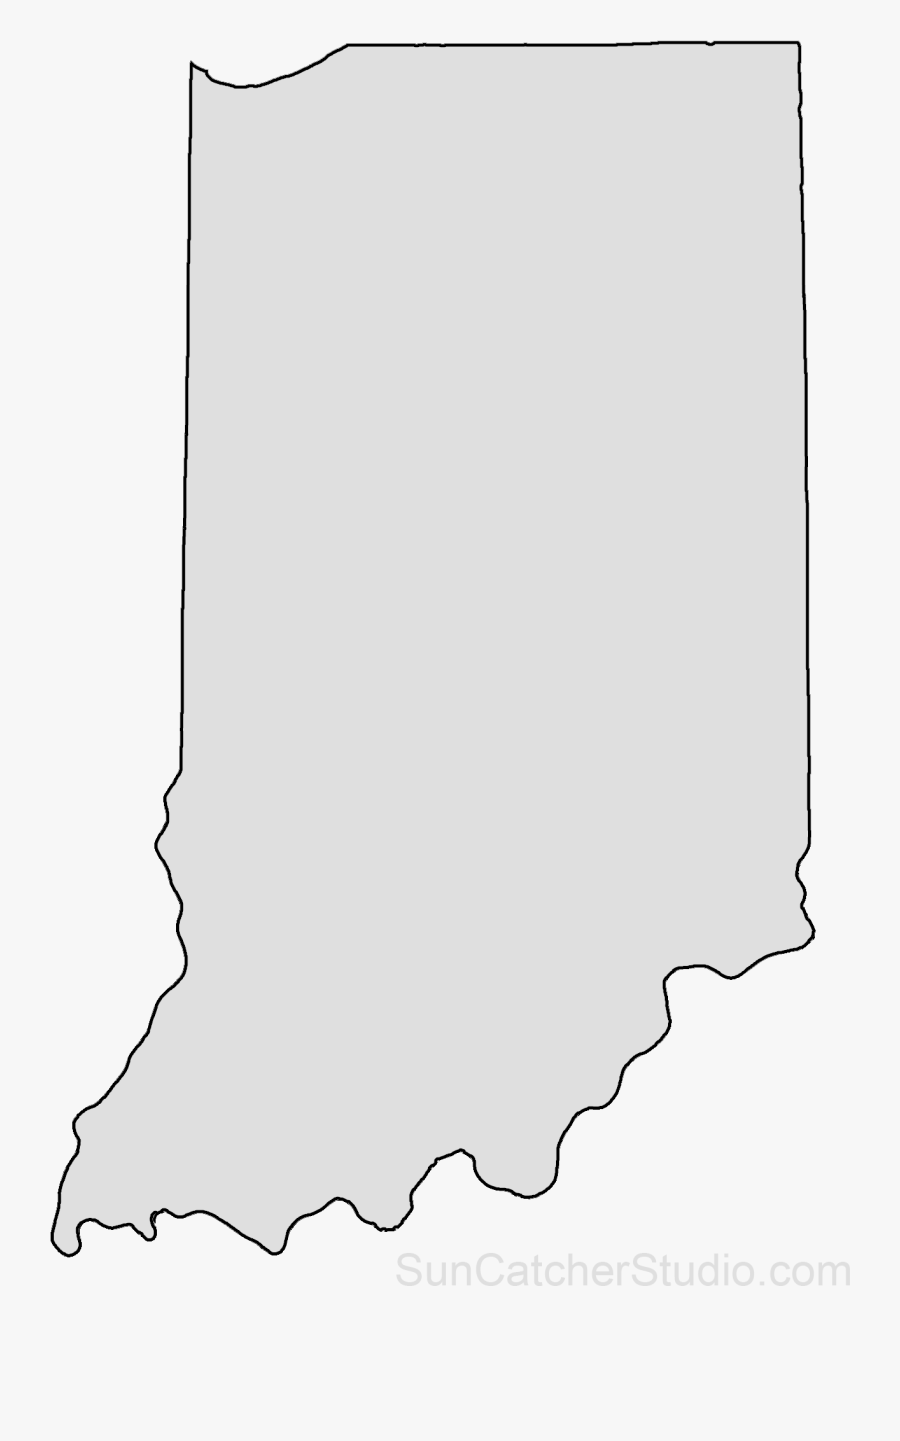 Clip Art Iowa State Map Outline - Transparent Indiana Outline, Transparent Clipart